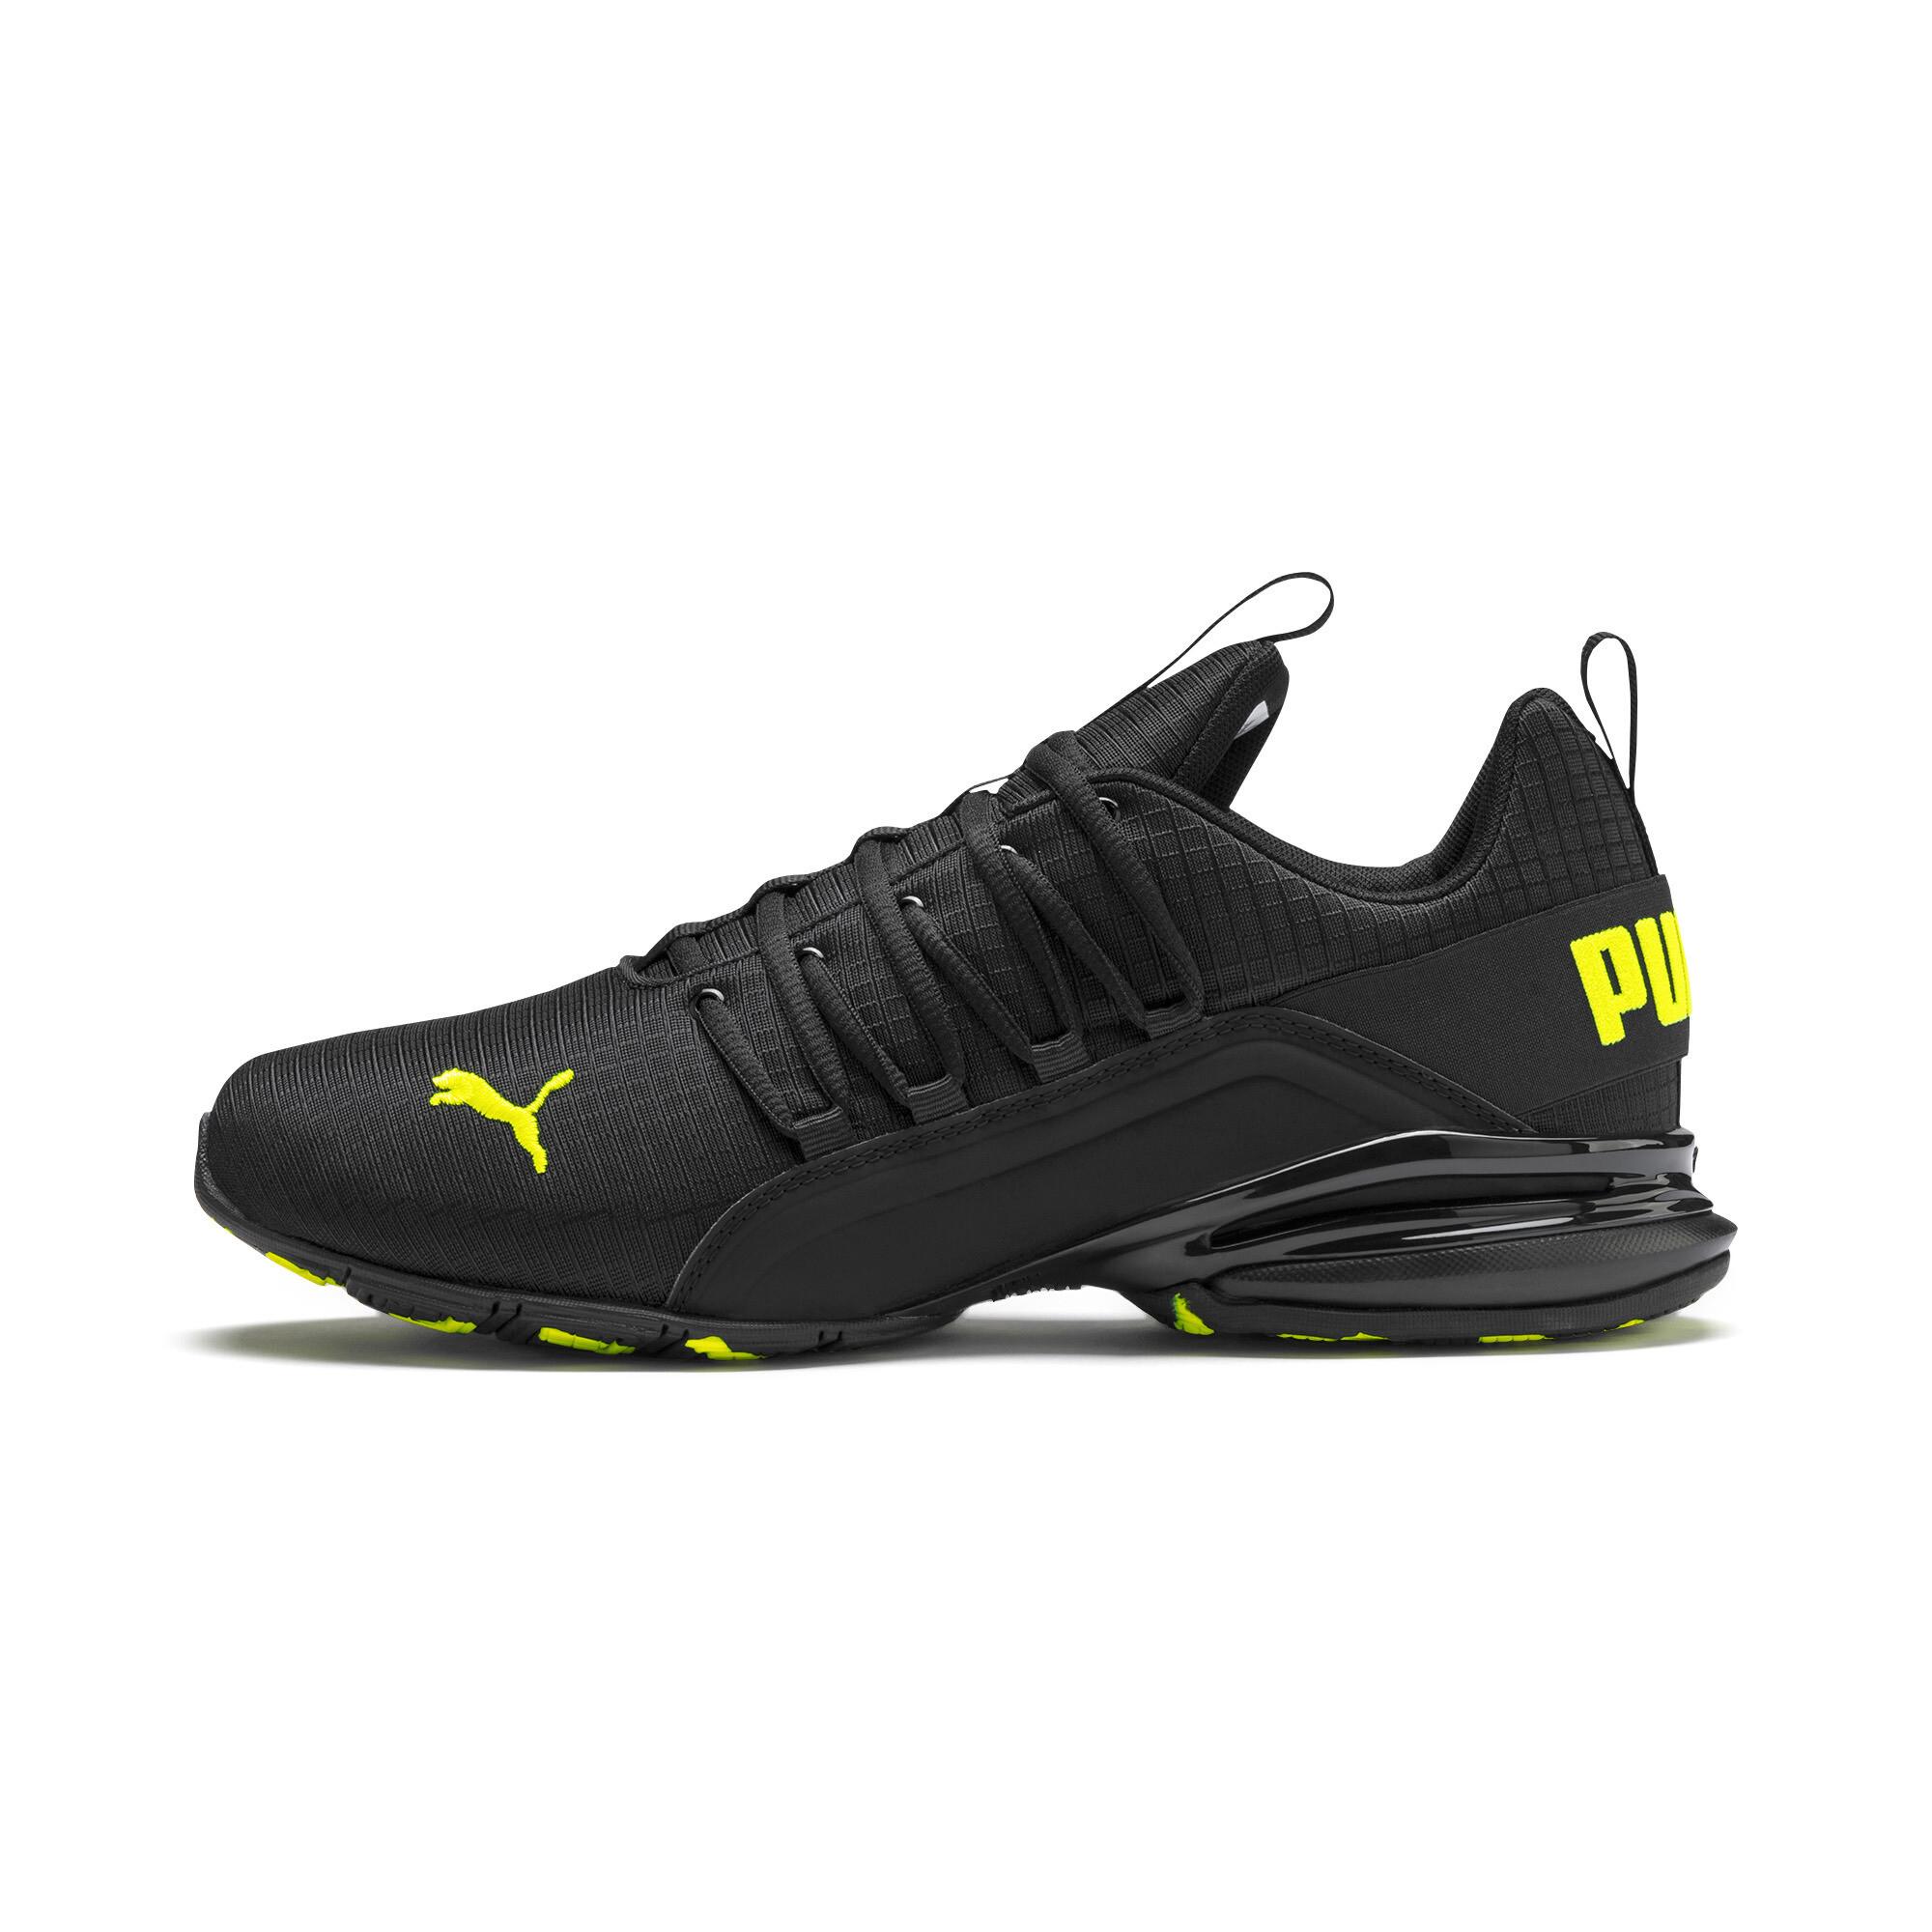 PUMA-Men-039-s-Axelion-Rip-Training-Shoes thumbnail 11